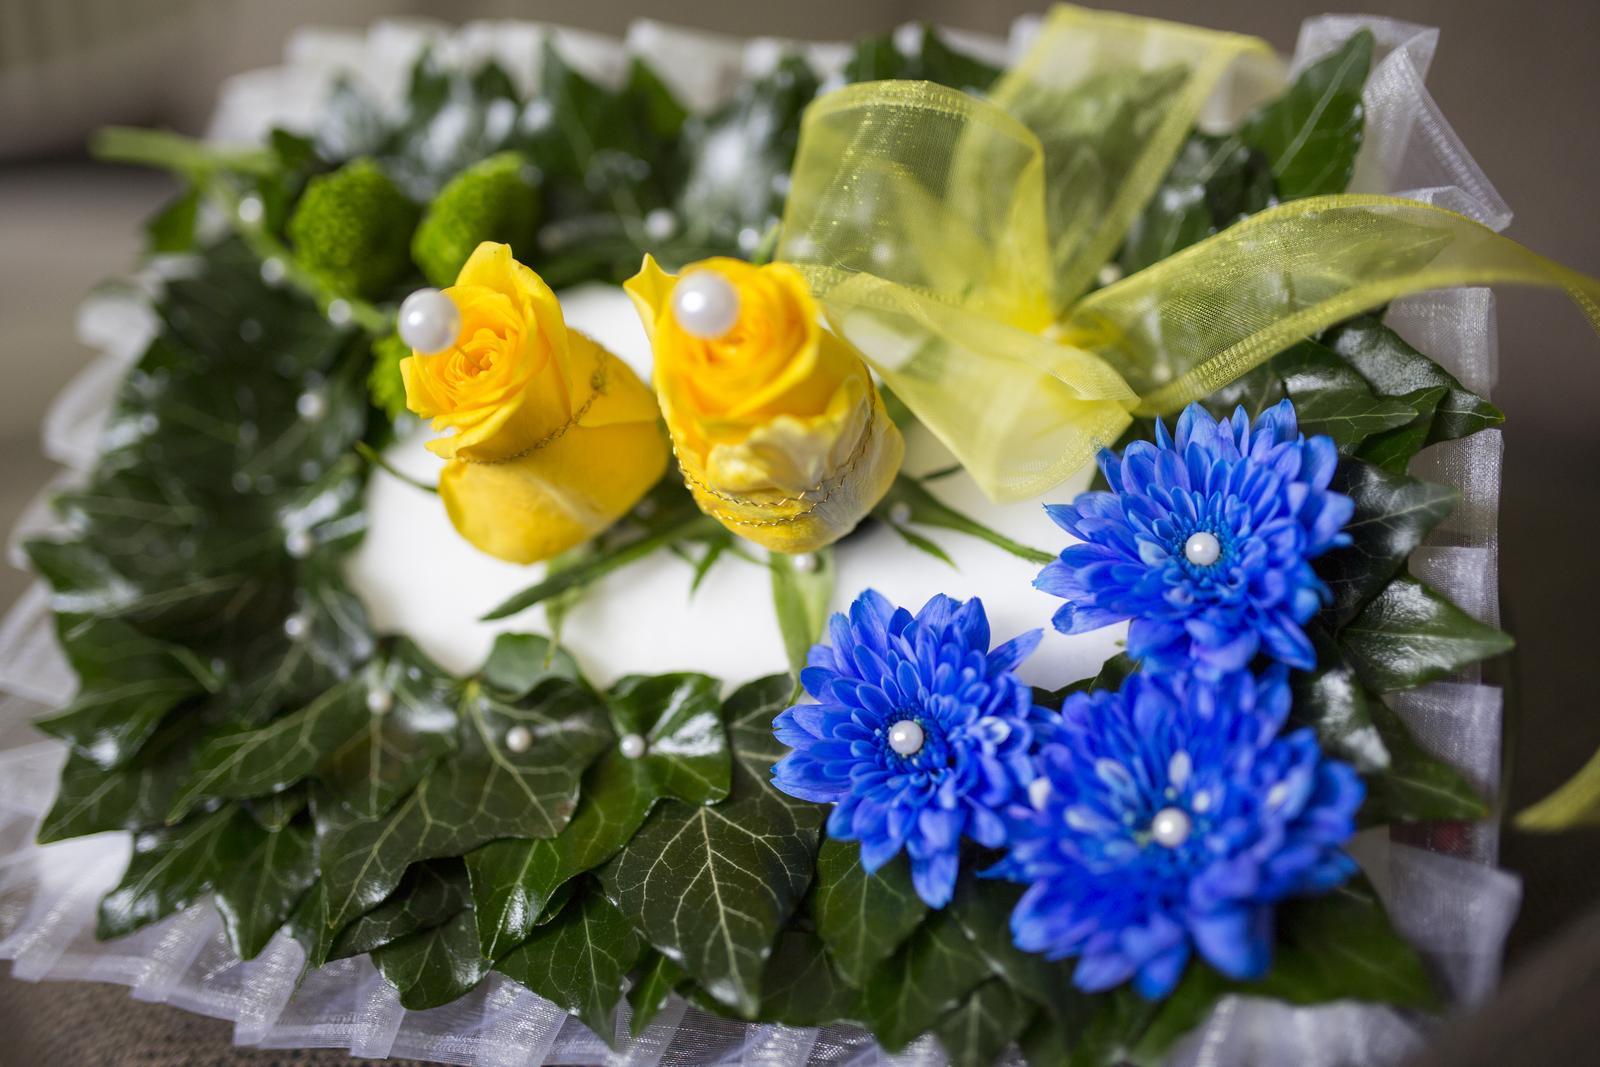 Modrá svatba - dekorace, doplňky - Obrázek č. 1